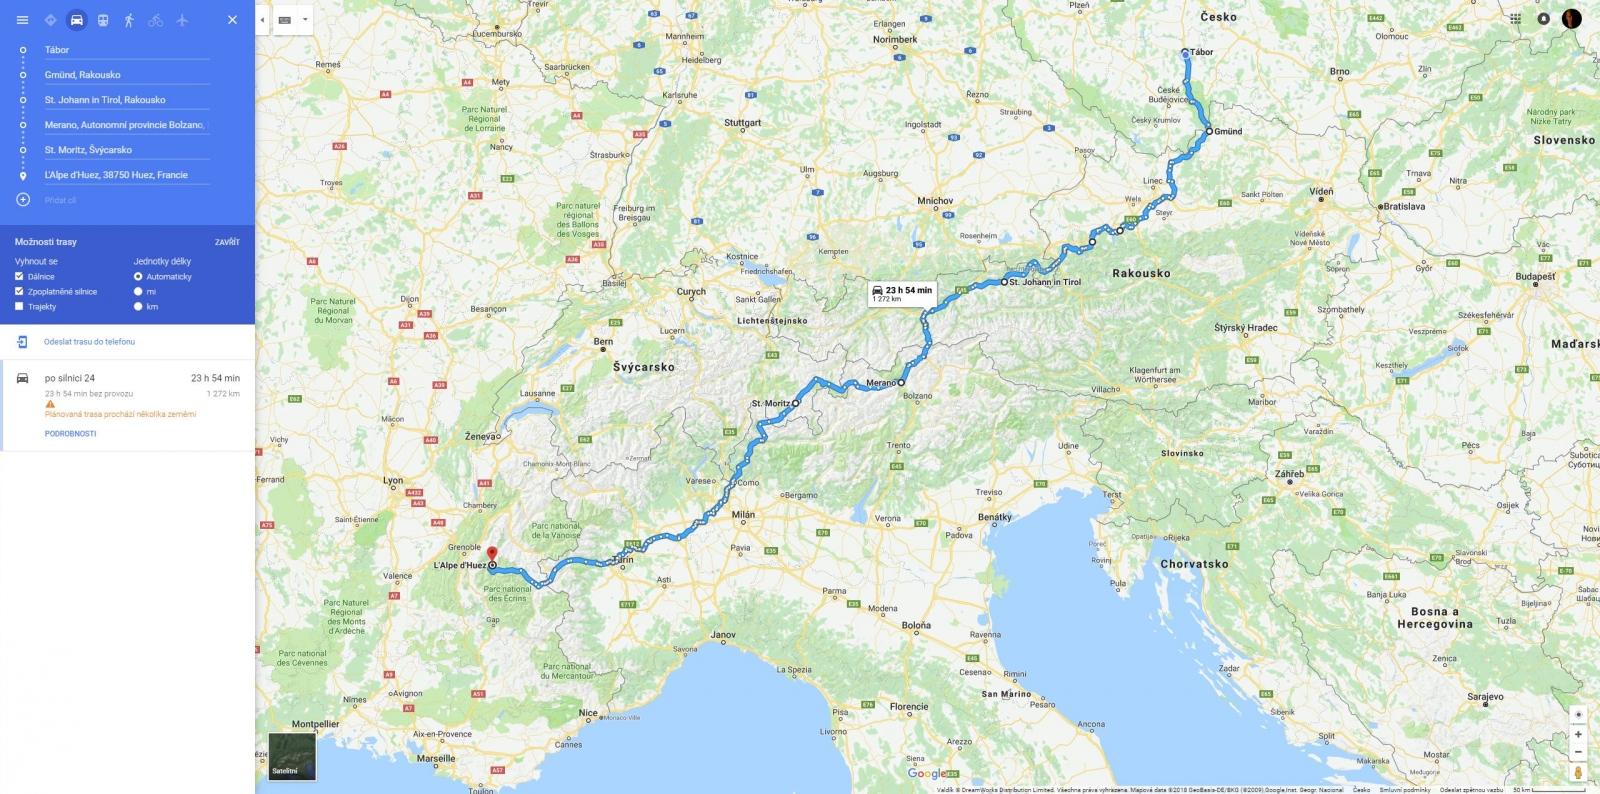 mapa2018.jpg